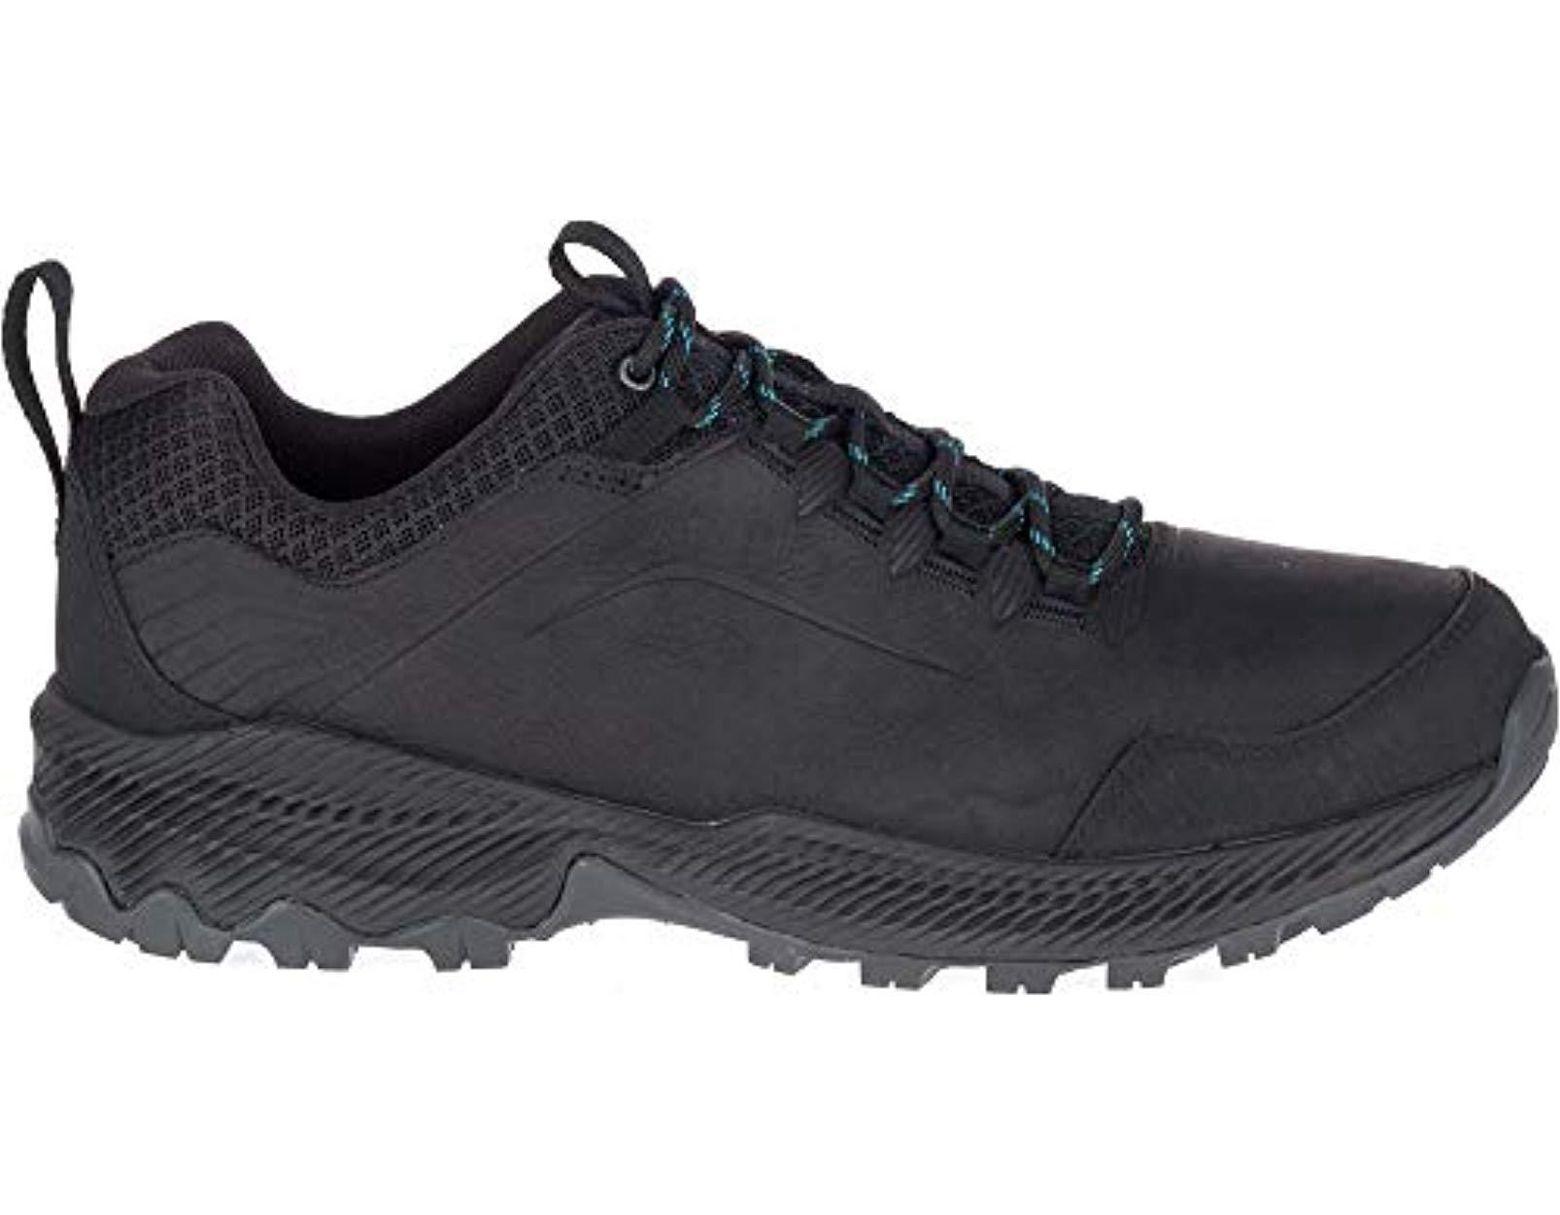 MERRELL Yokota 2 J46547 Outdoor Hiking Trekking Trainers Athletic Shoes Mens New